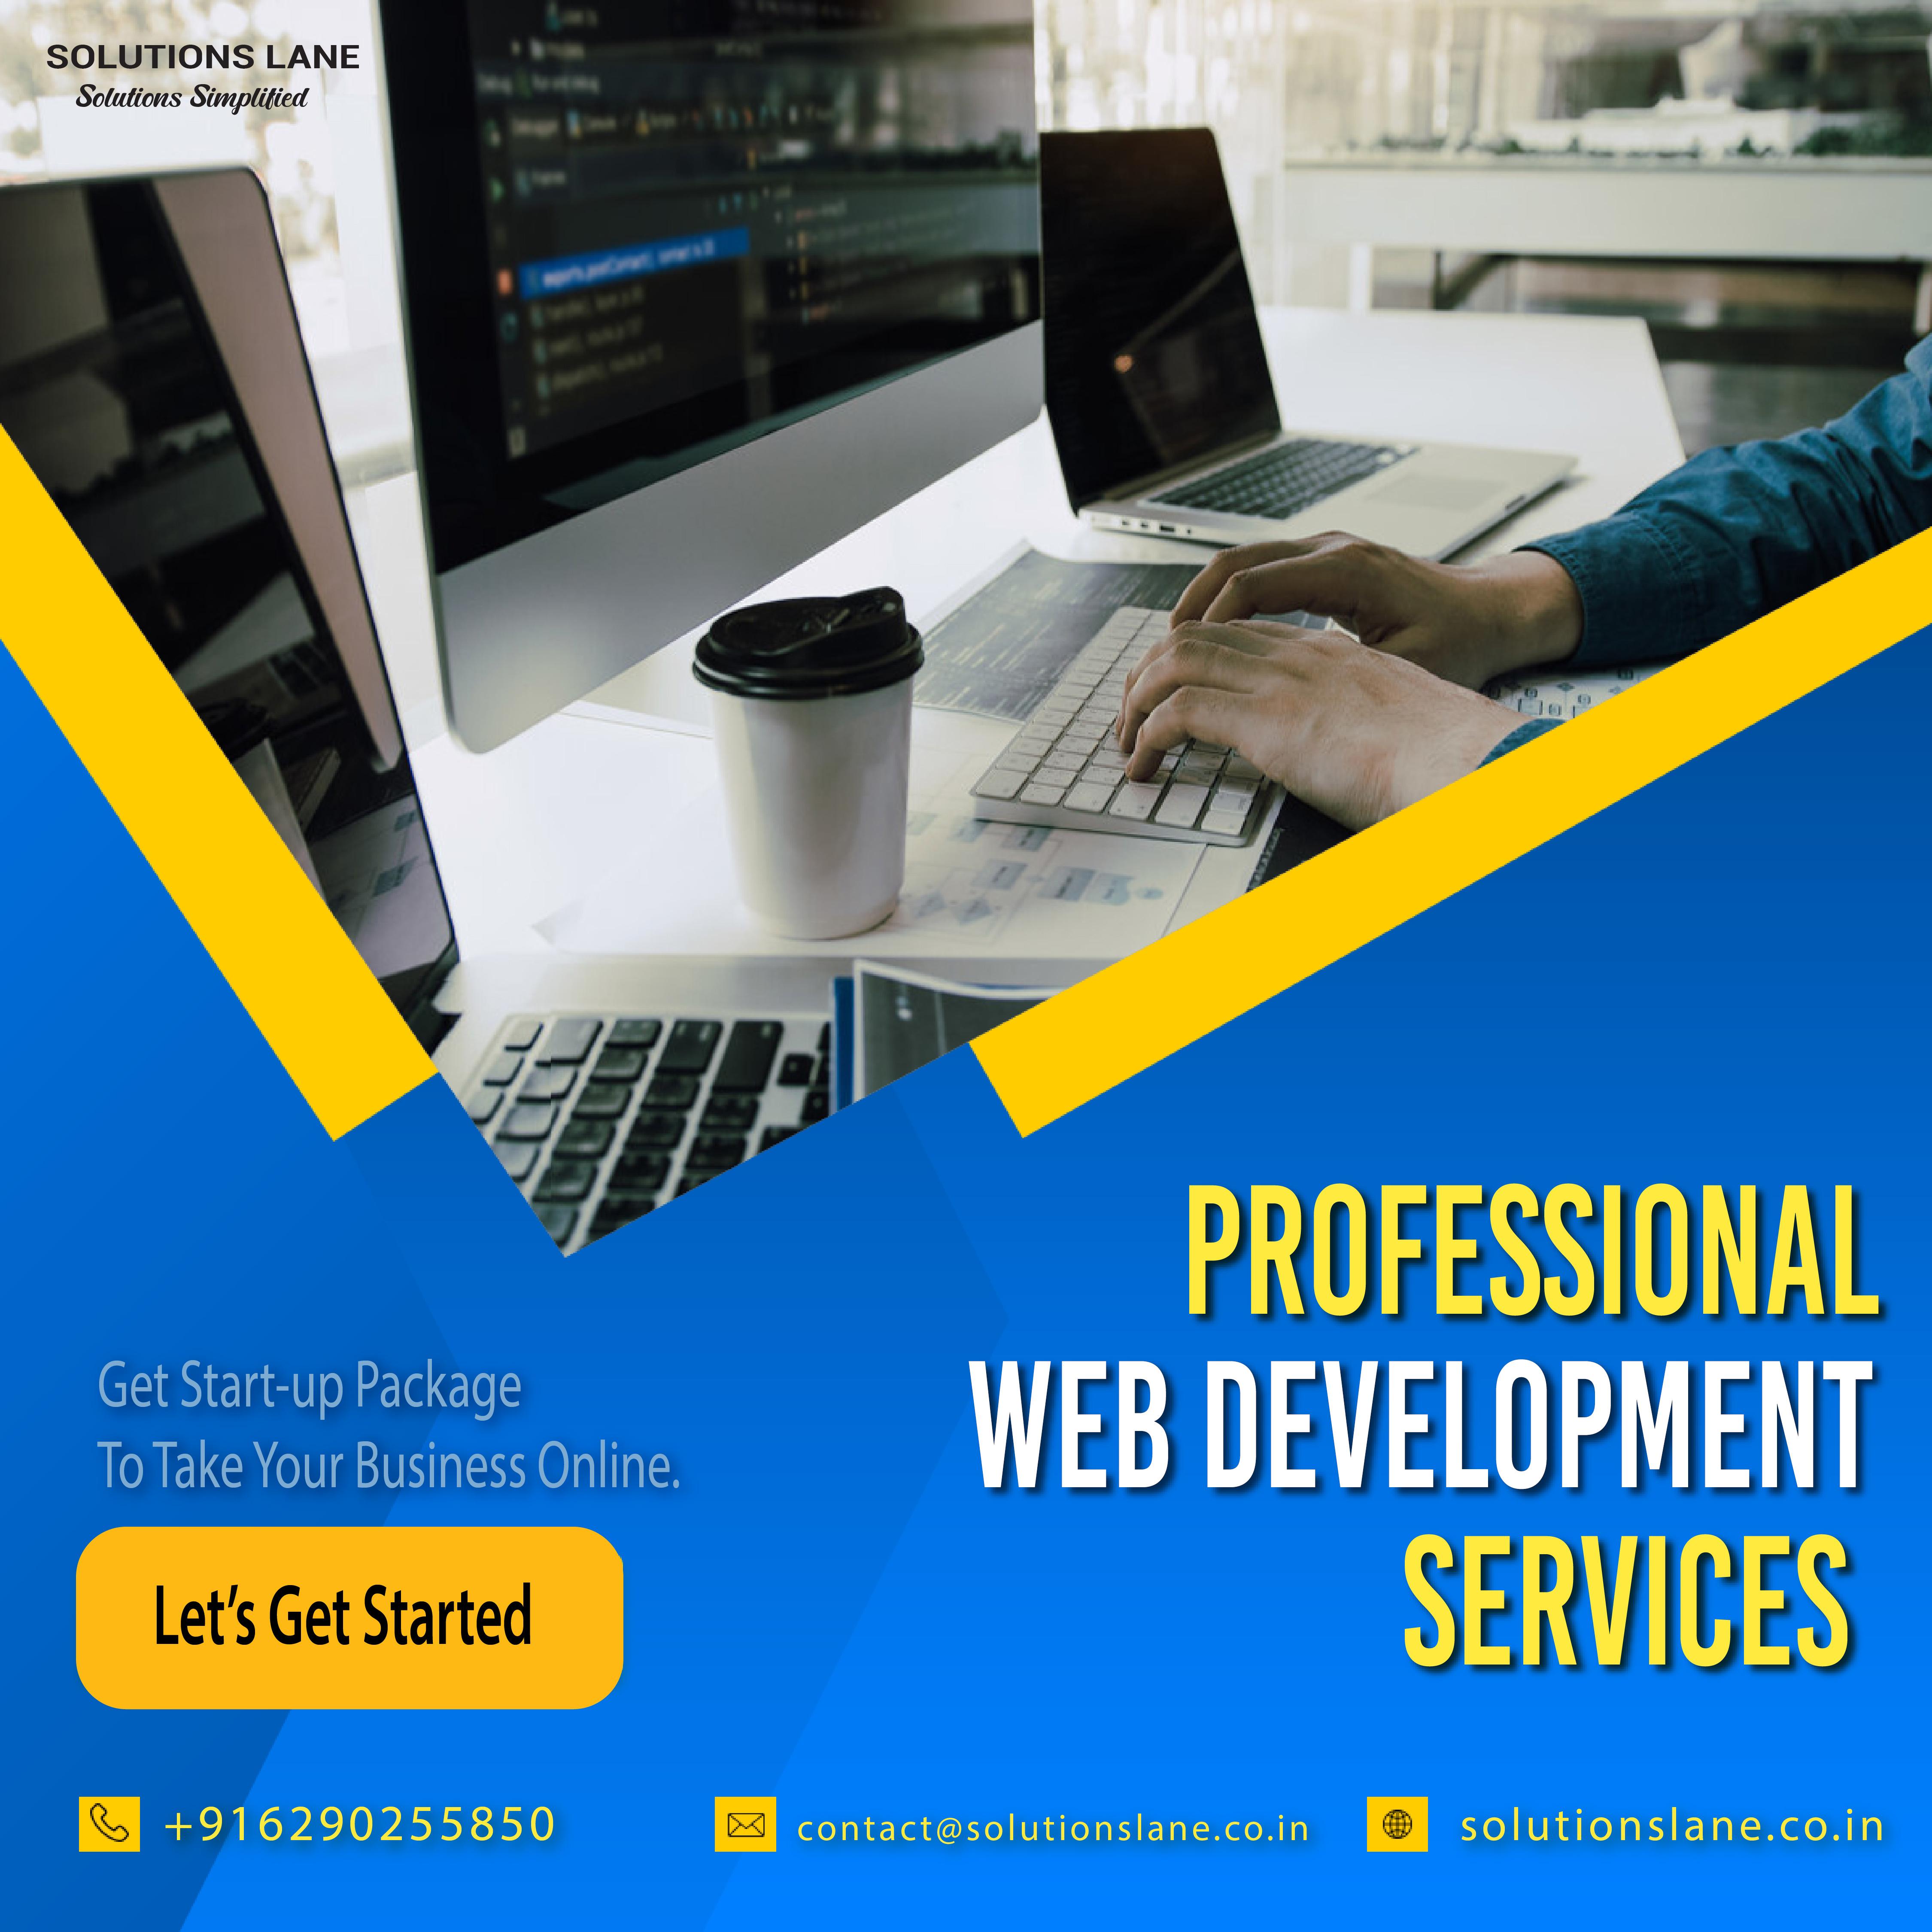 Professional Web Development Services in Kolkata